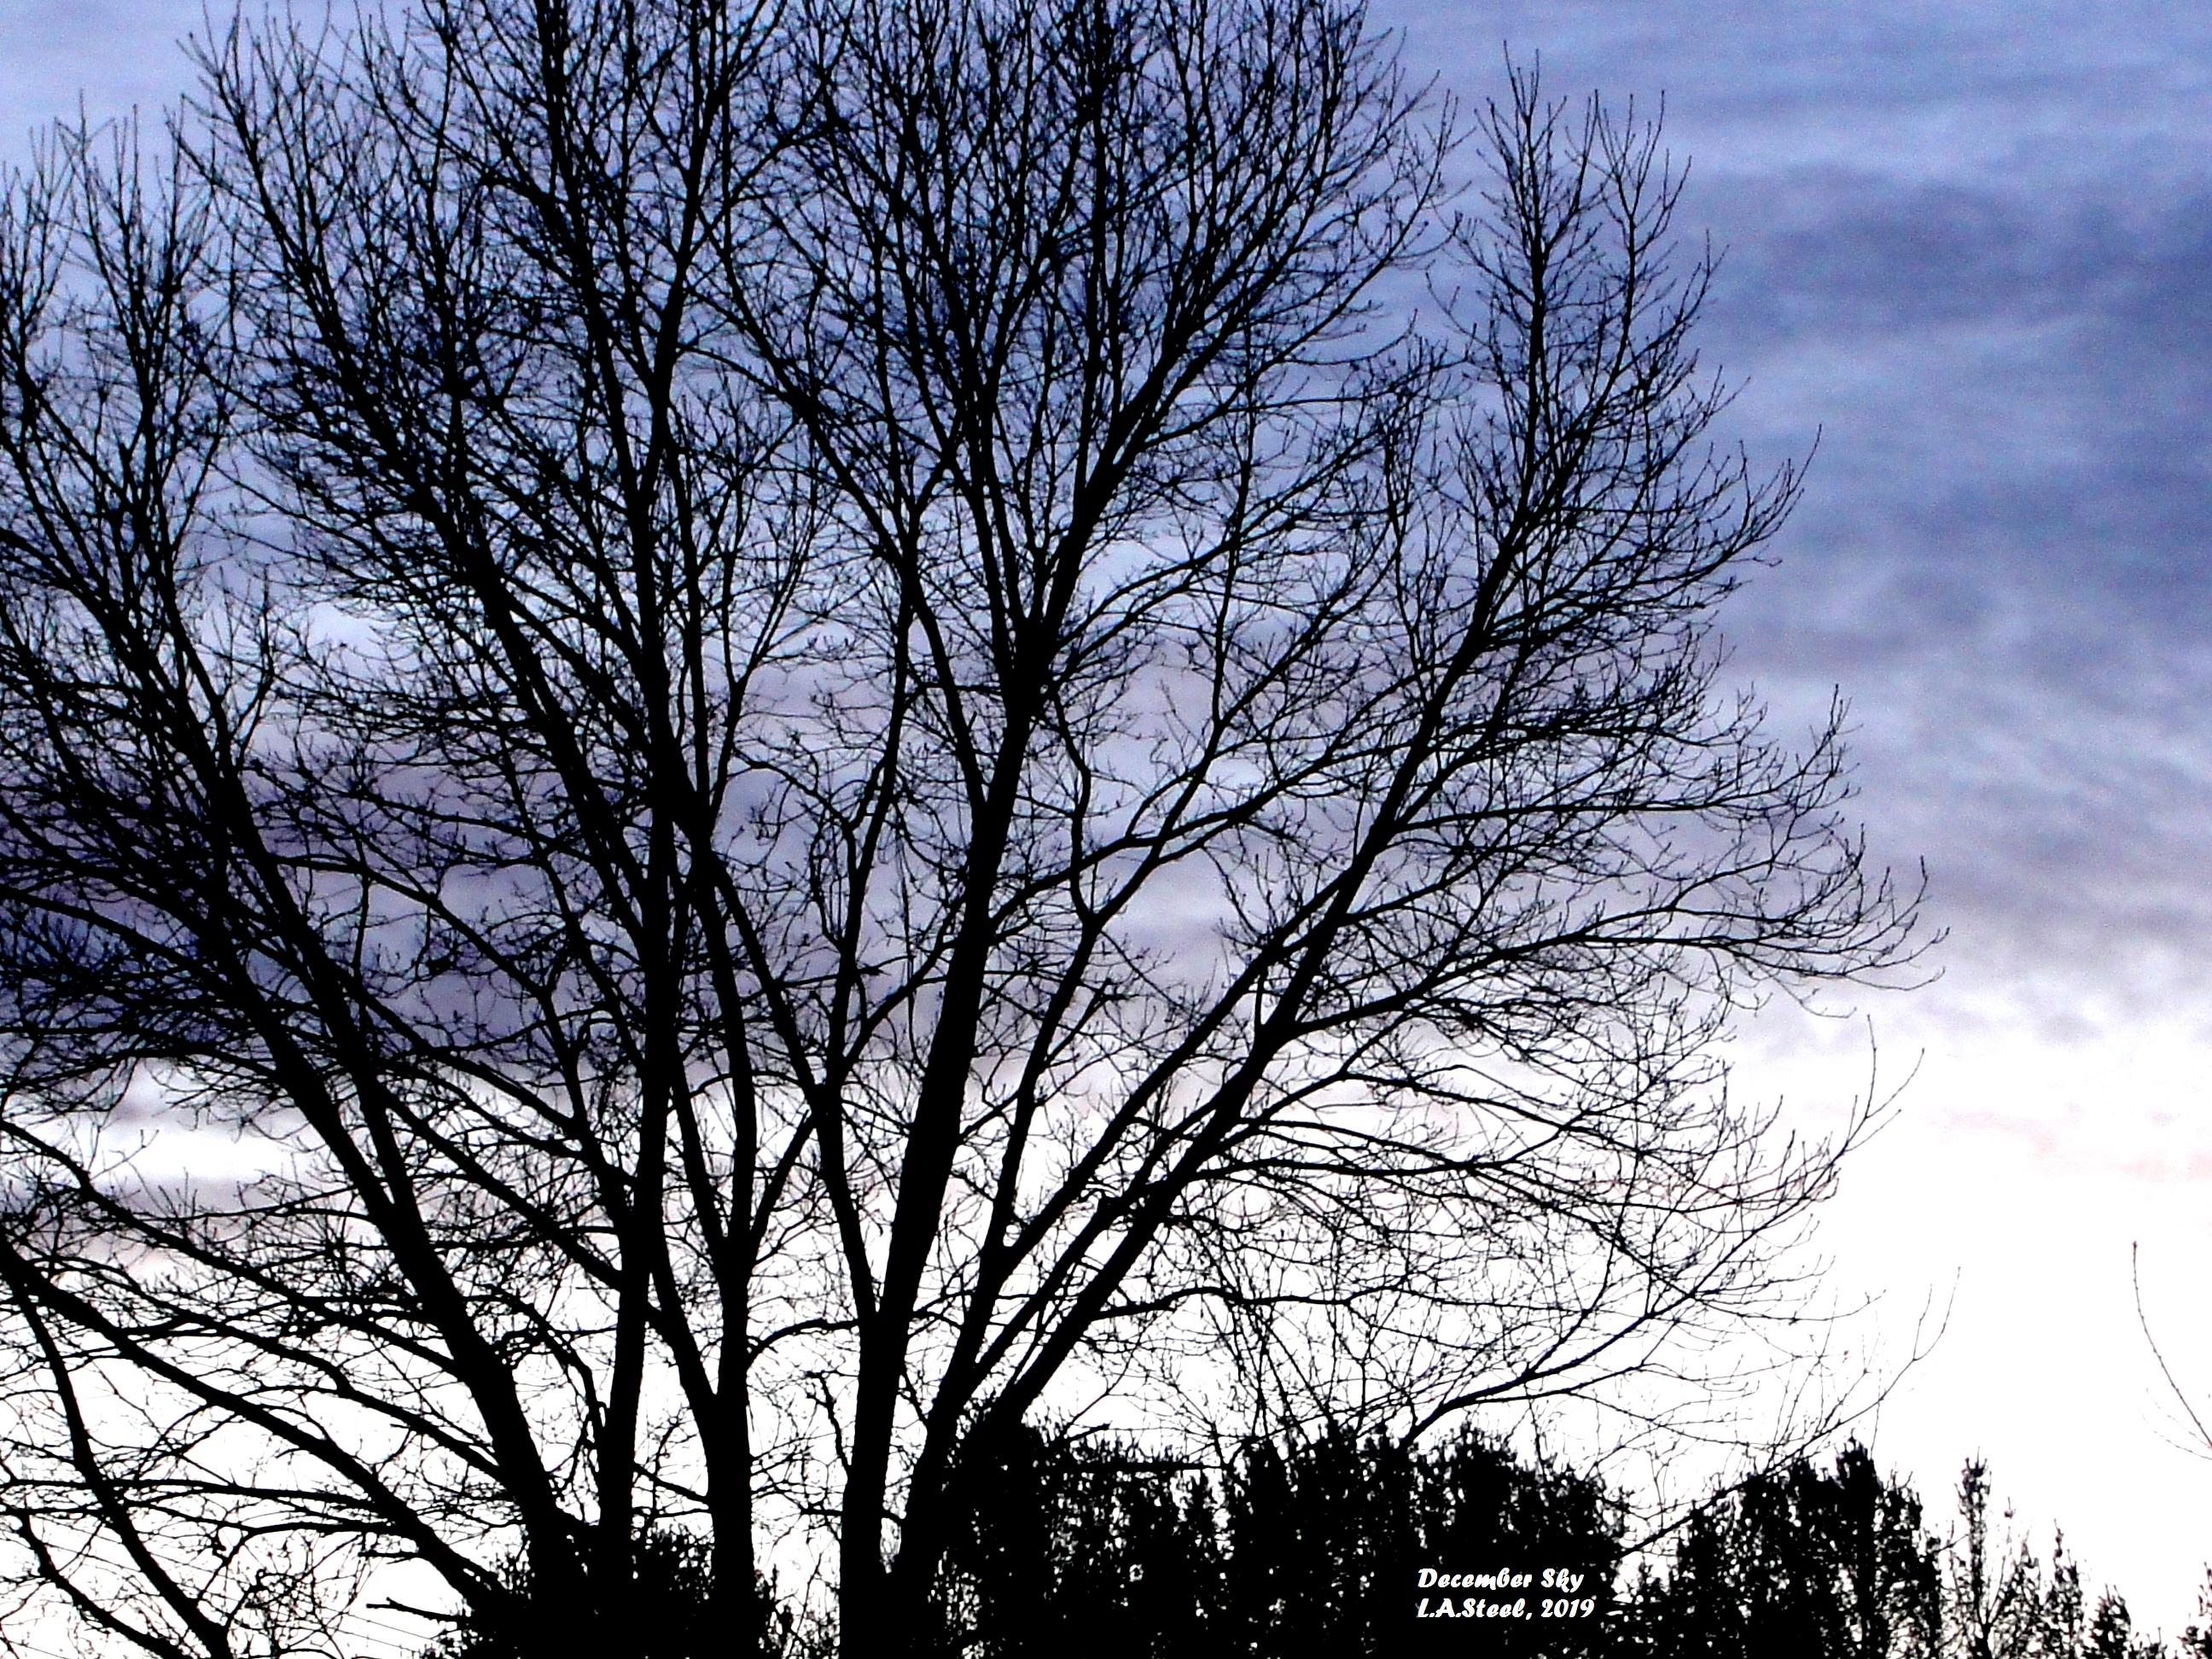 December sky 2019